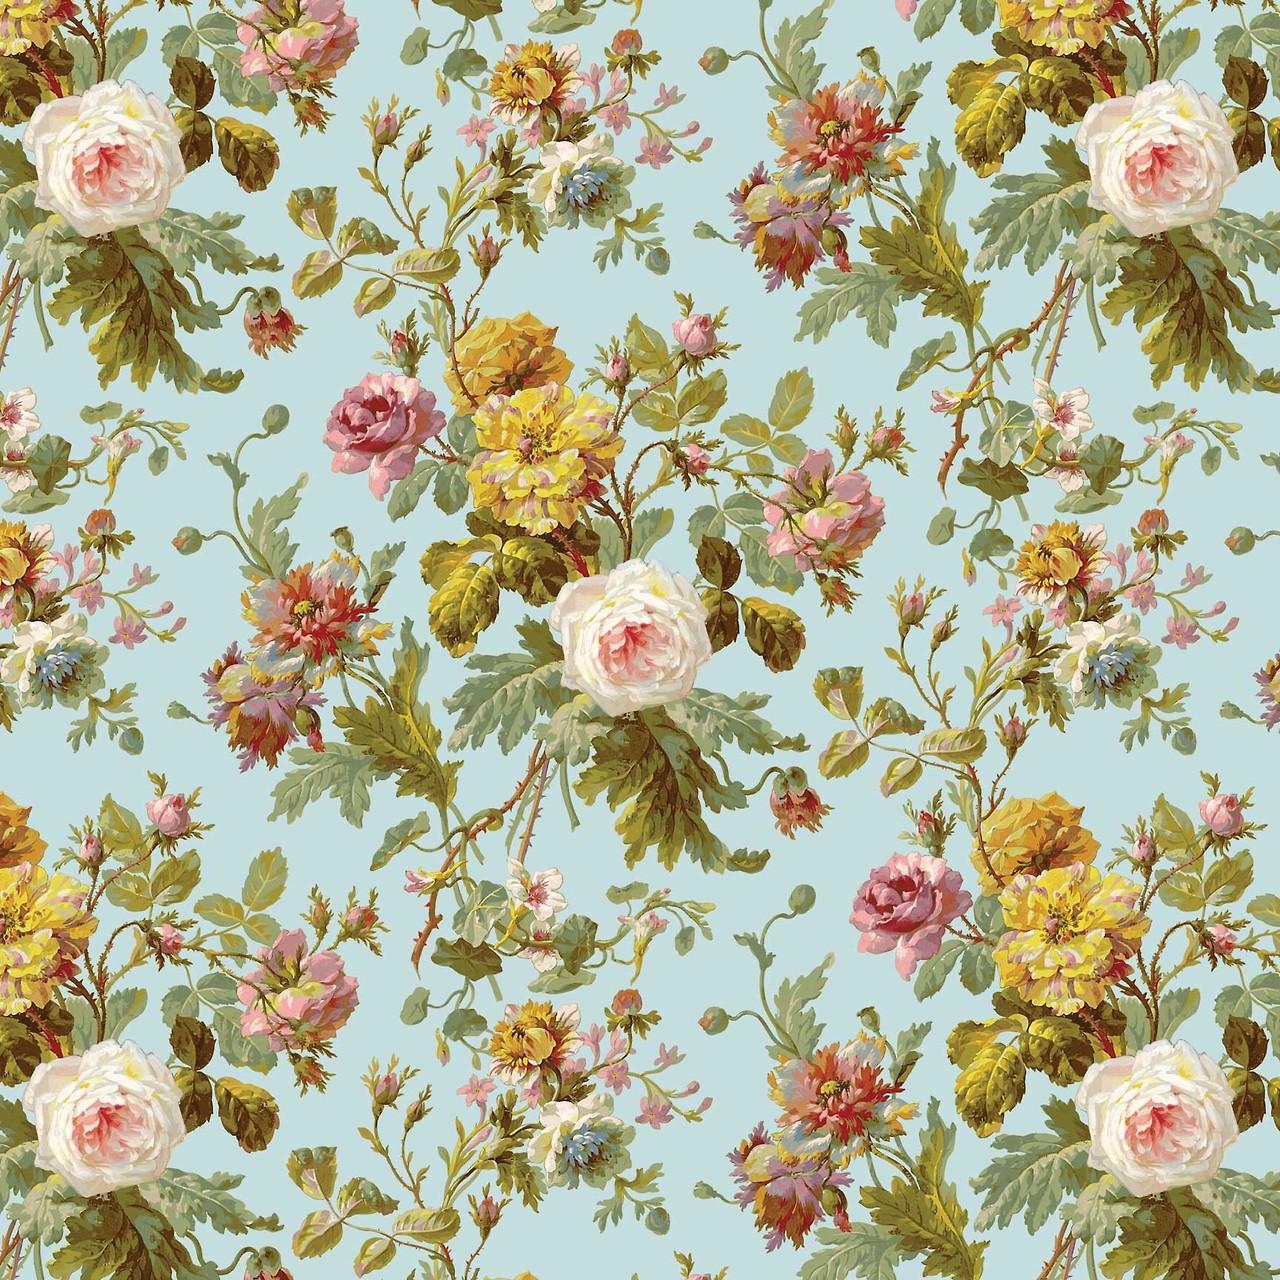 Displaying 14 Images For Vintage Flower Pattern Tumblr 1280x1280